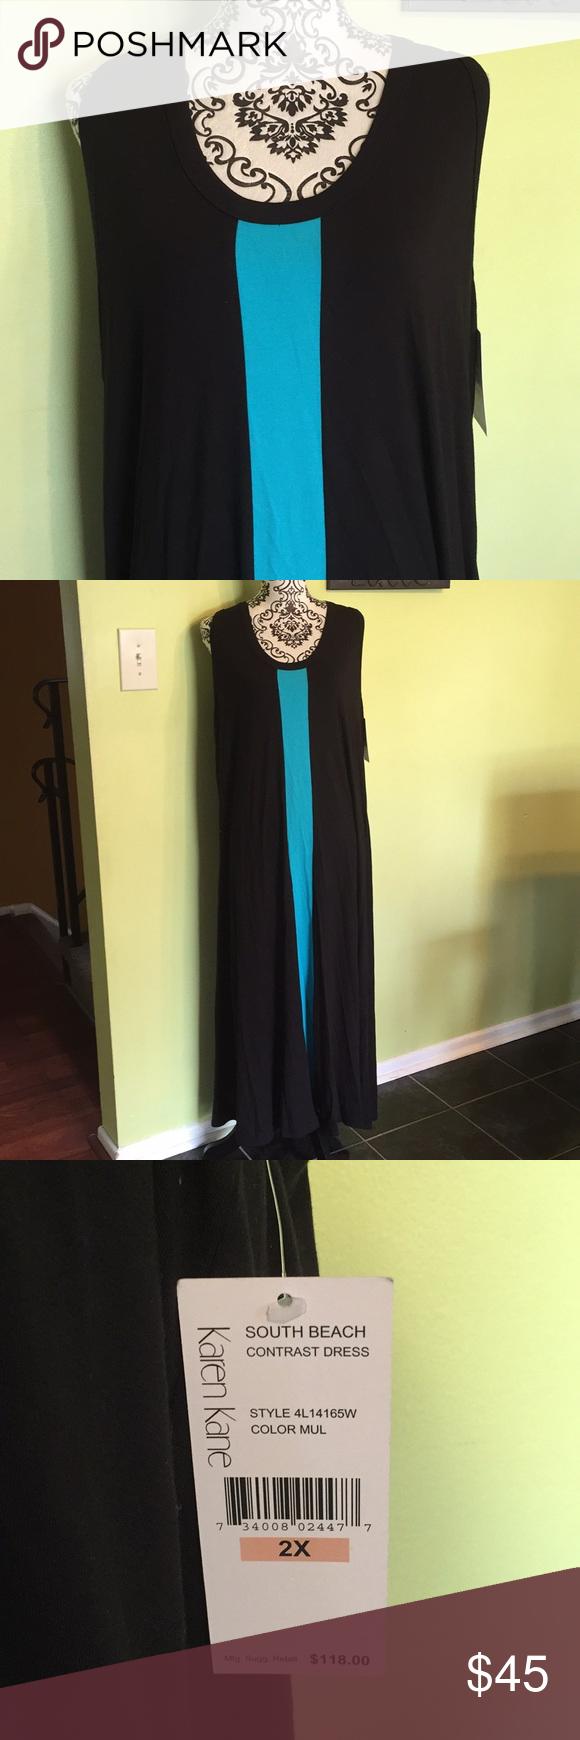 Nwt Karen Kane Maxi Dress Beautiful Black Maxi With Turquoise Vertical Strip Down The Front Middle Can Be Easi Contrast Dress Karen Kane Dress Clothes Design [ 1740 x 580 Pixel ]